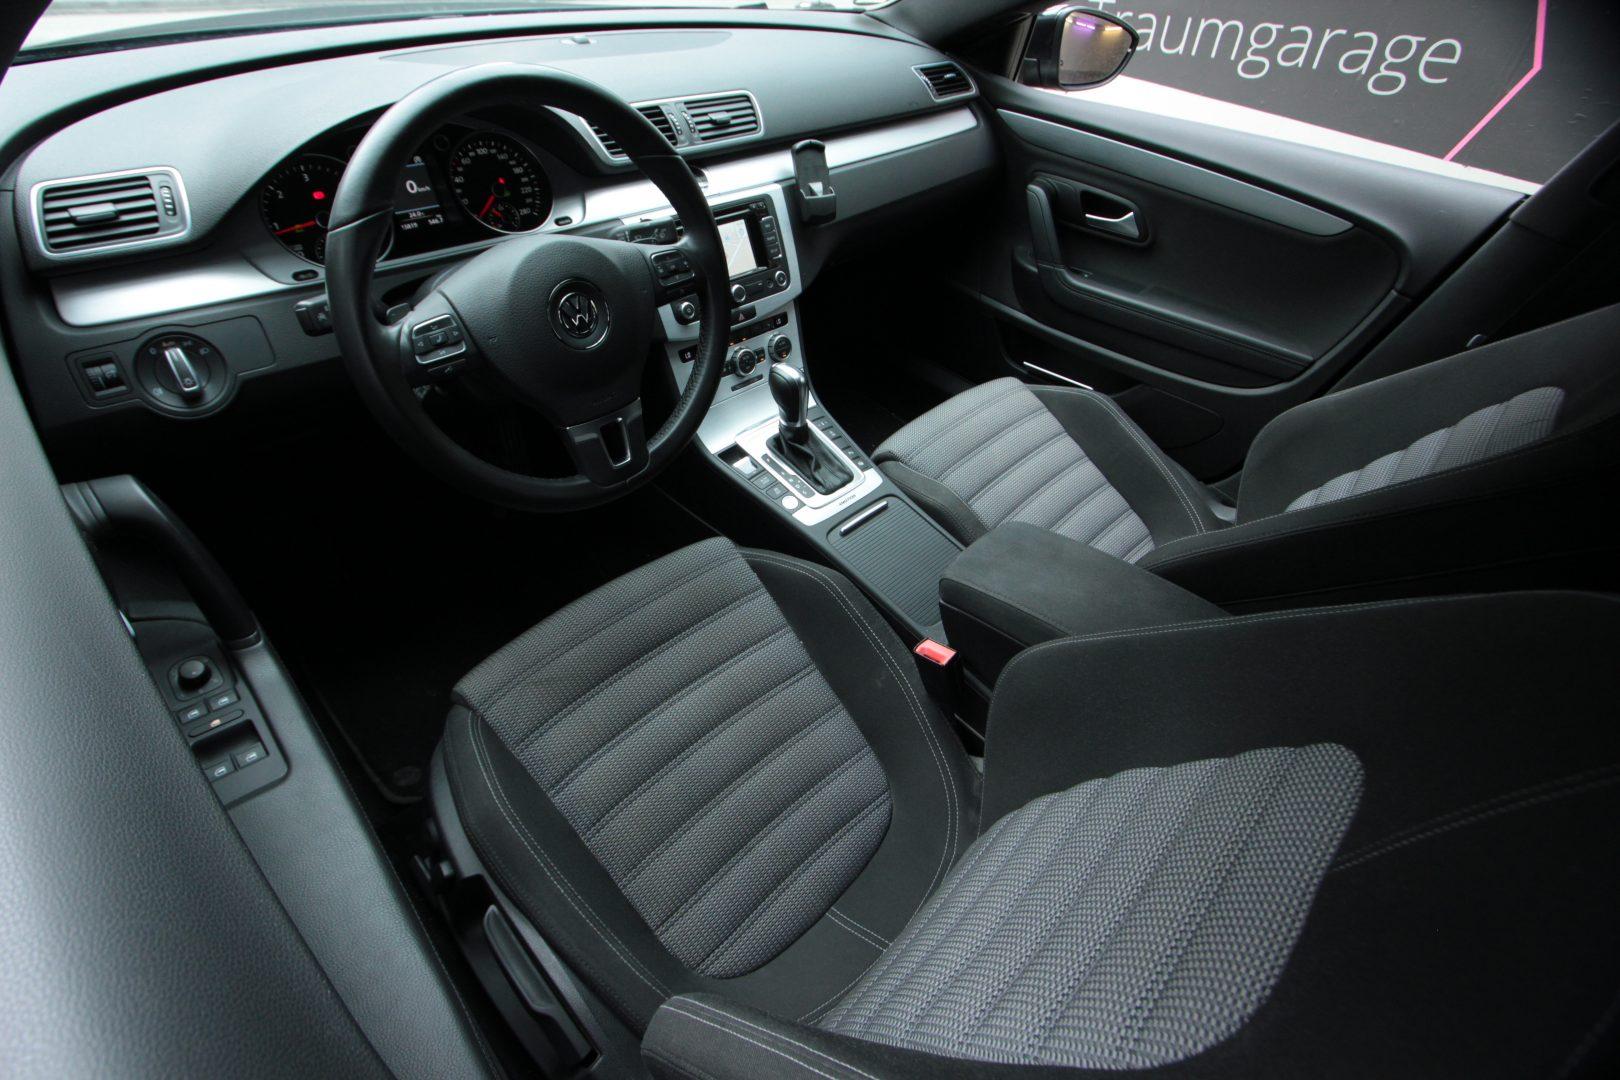 AIL VW CC 2.0TDI Basis BMT 4Motion DSG 1